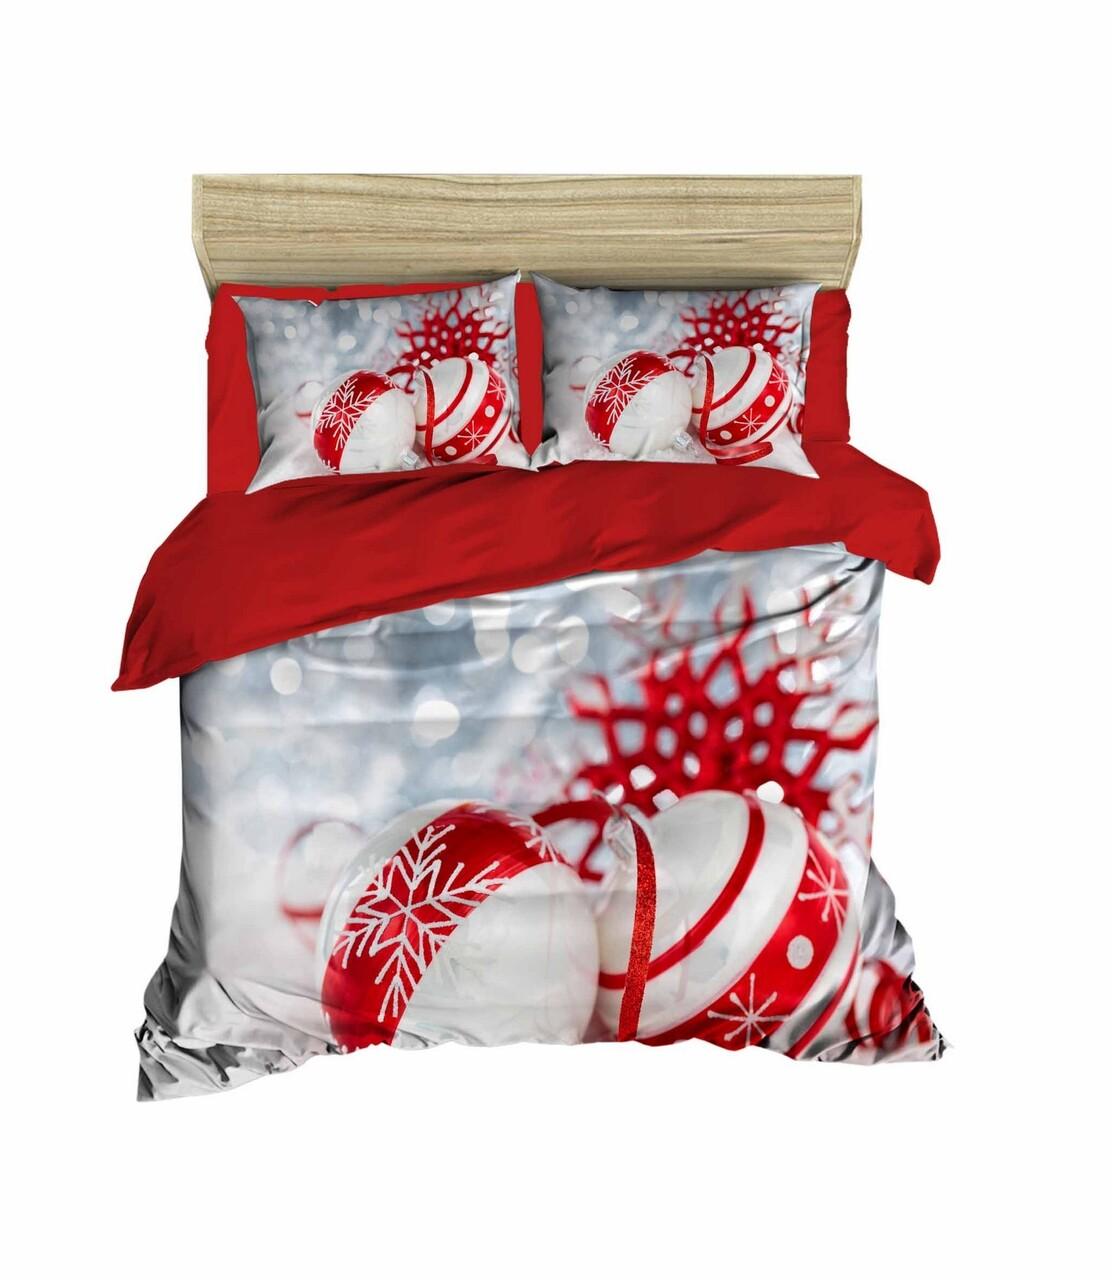 Lenjerie de pat pentru doua persoane, Pearl Home, 406, print 3D, policoton, 4 piese, rosu/alb/gri